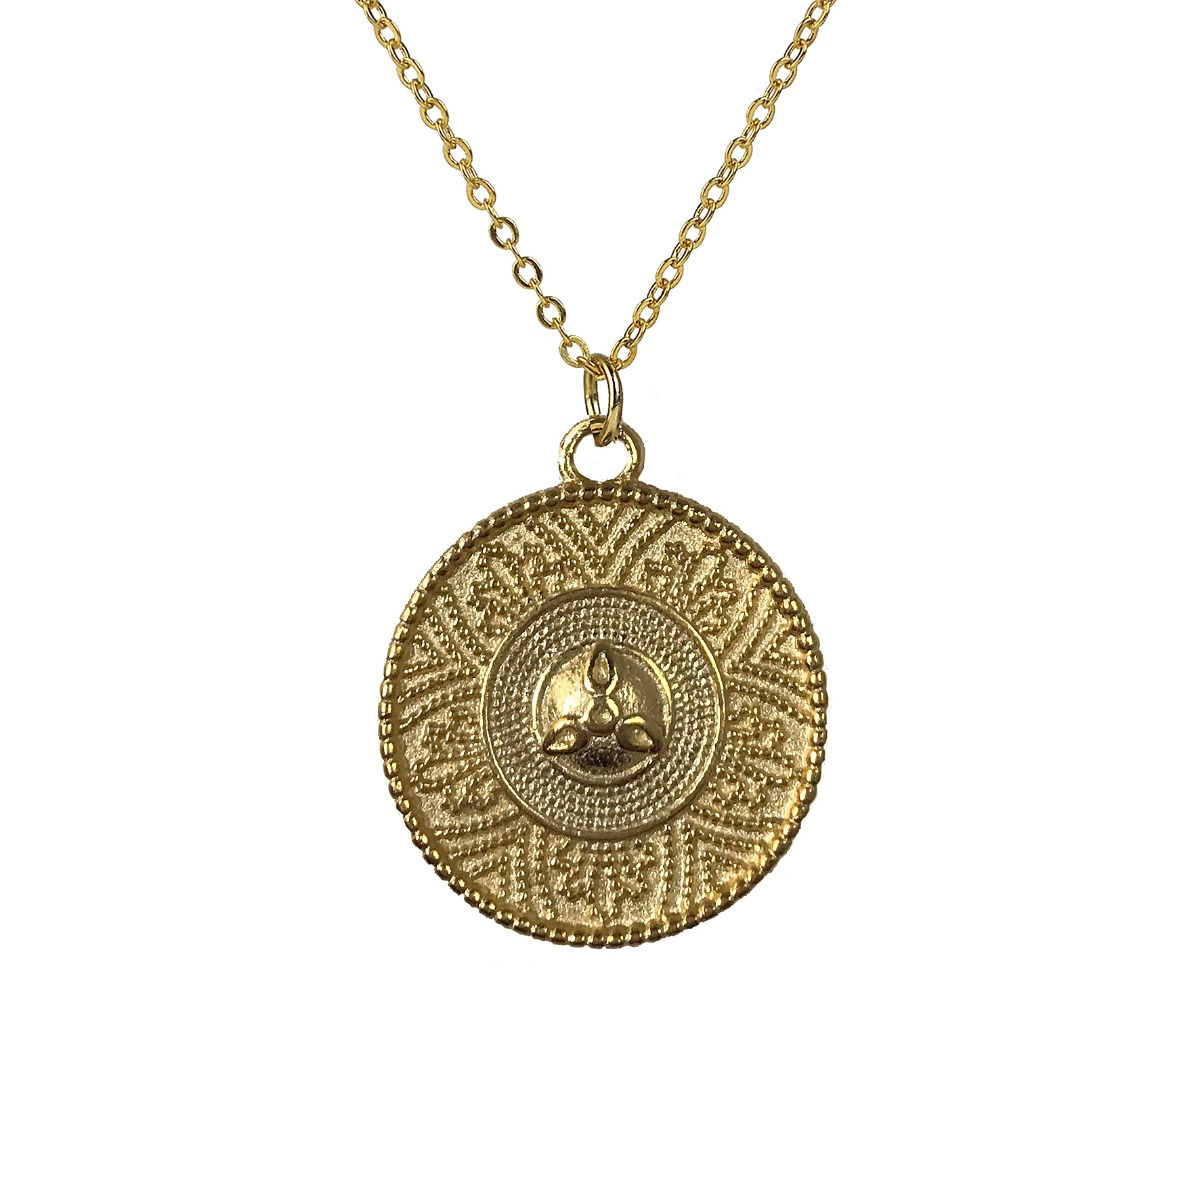 Etruscan revival necklace